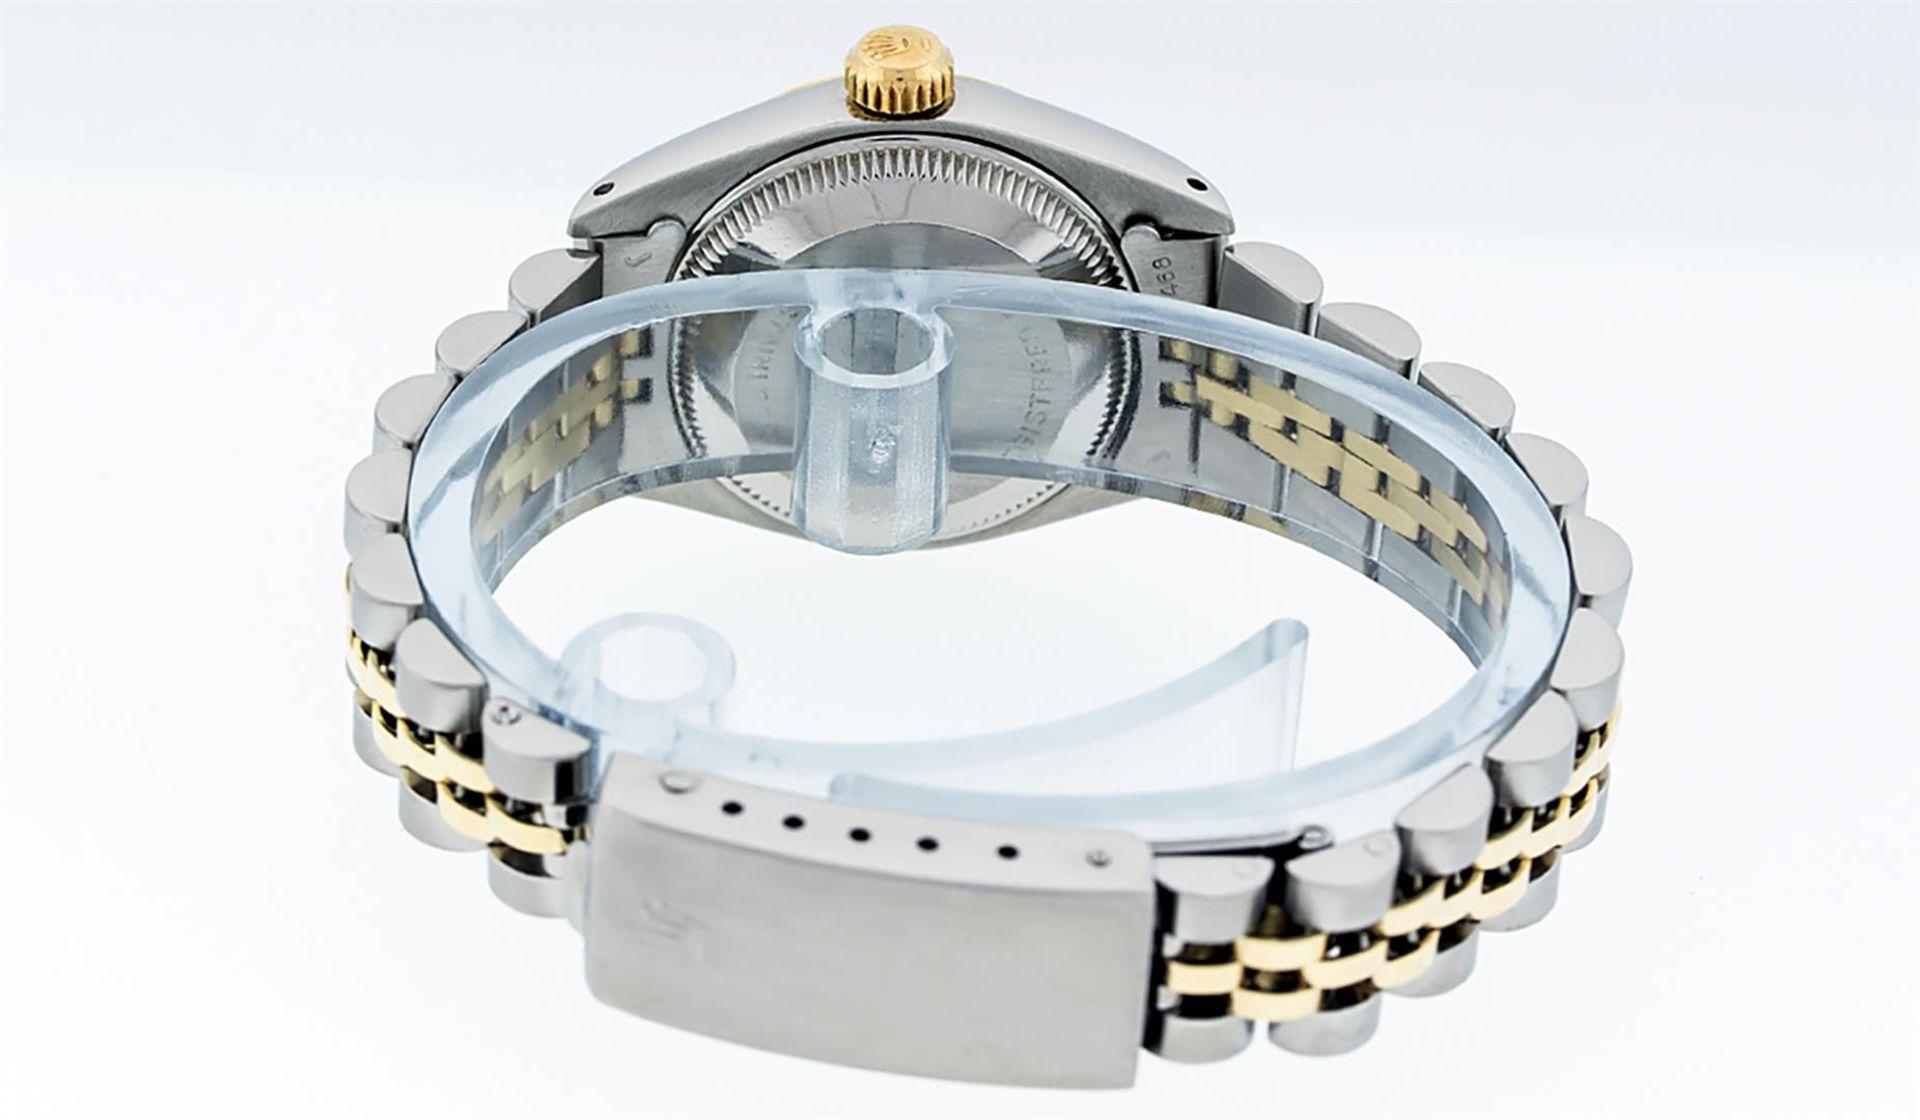 Rolex Ladies 2 Tone White Diamond 26MM Datejust Wristwatch - Image 8 of 8